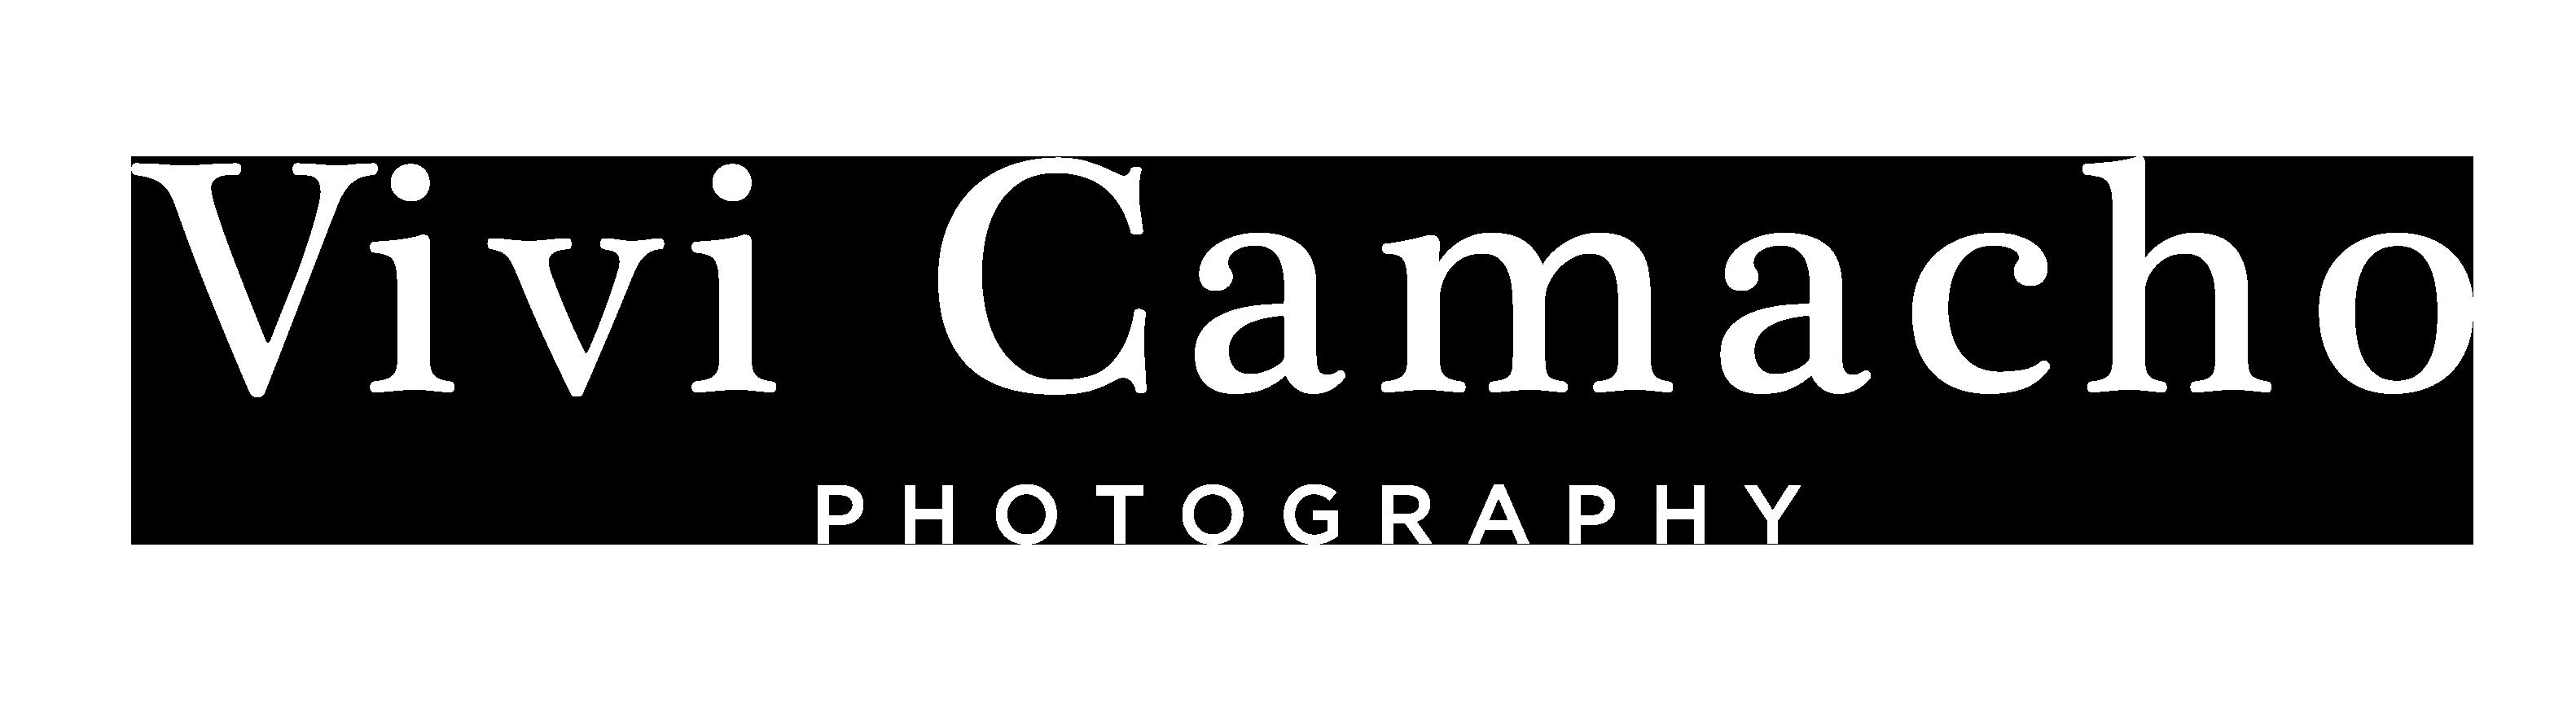 Vivi Camacho Photography